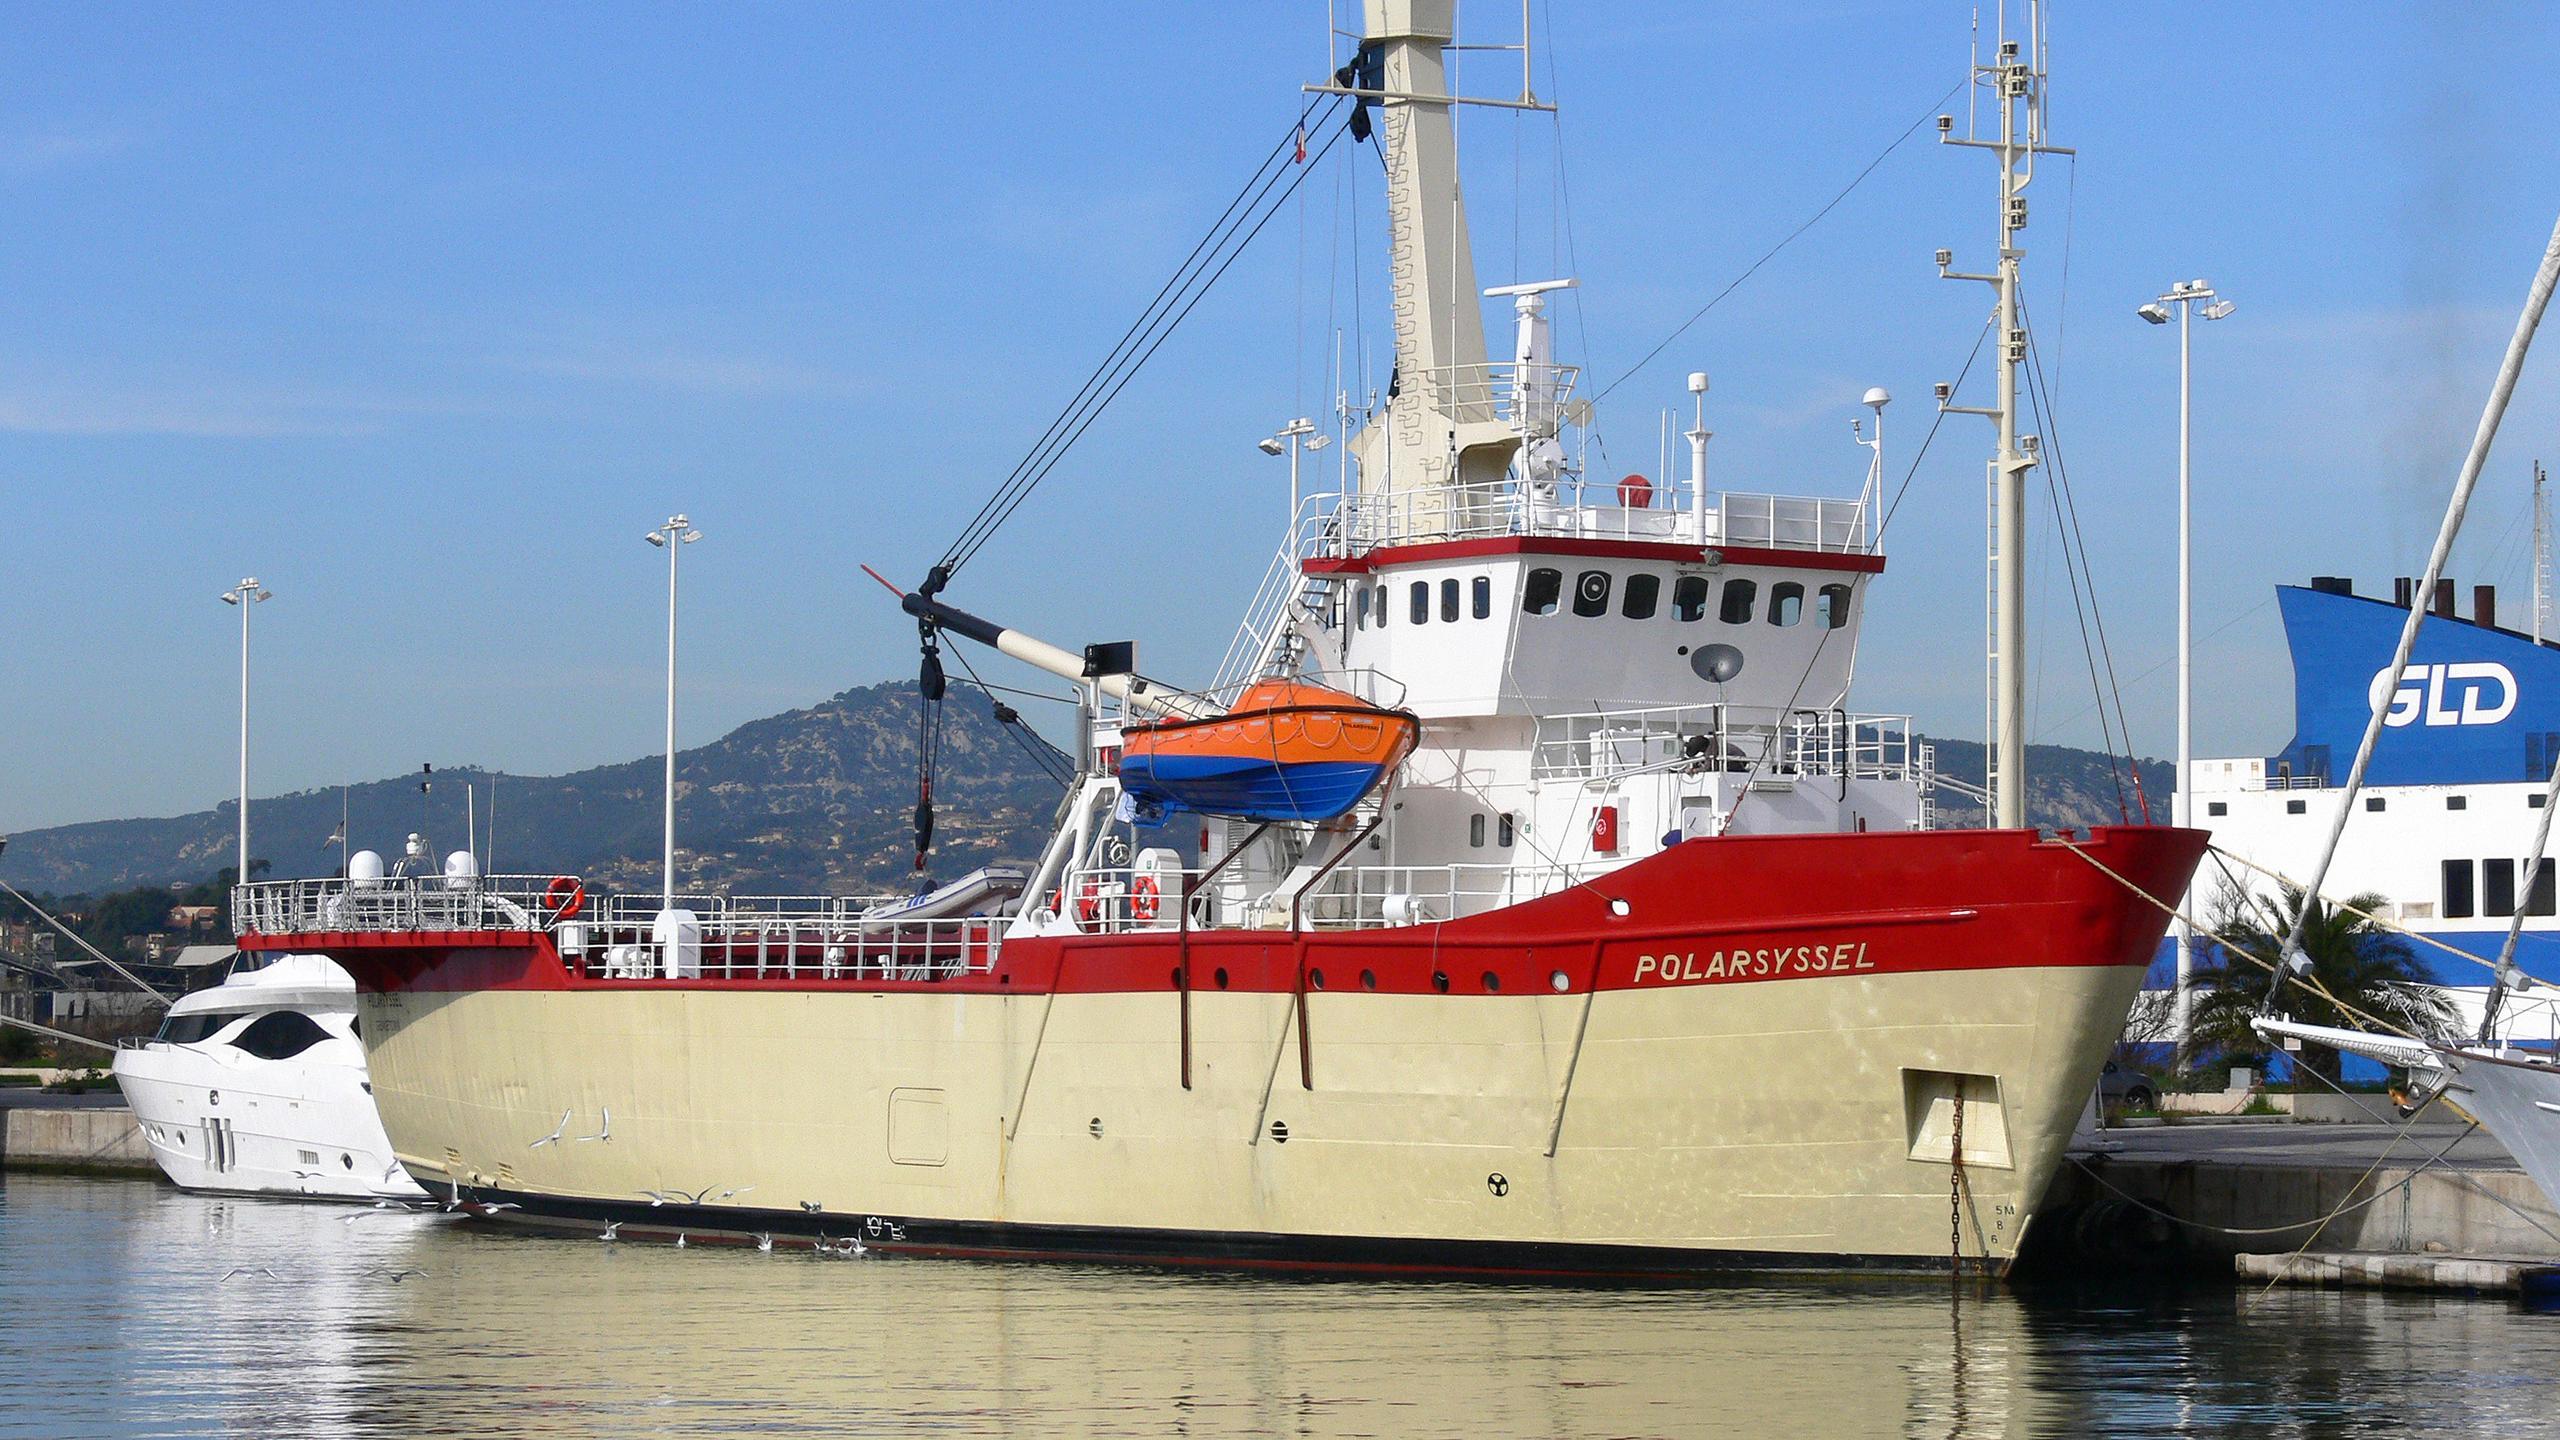 polarsyssel-expedition-yacht-hoivolds-1976-50m-half-profile-moored